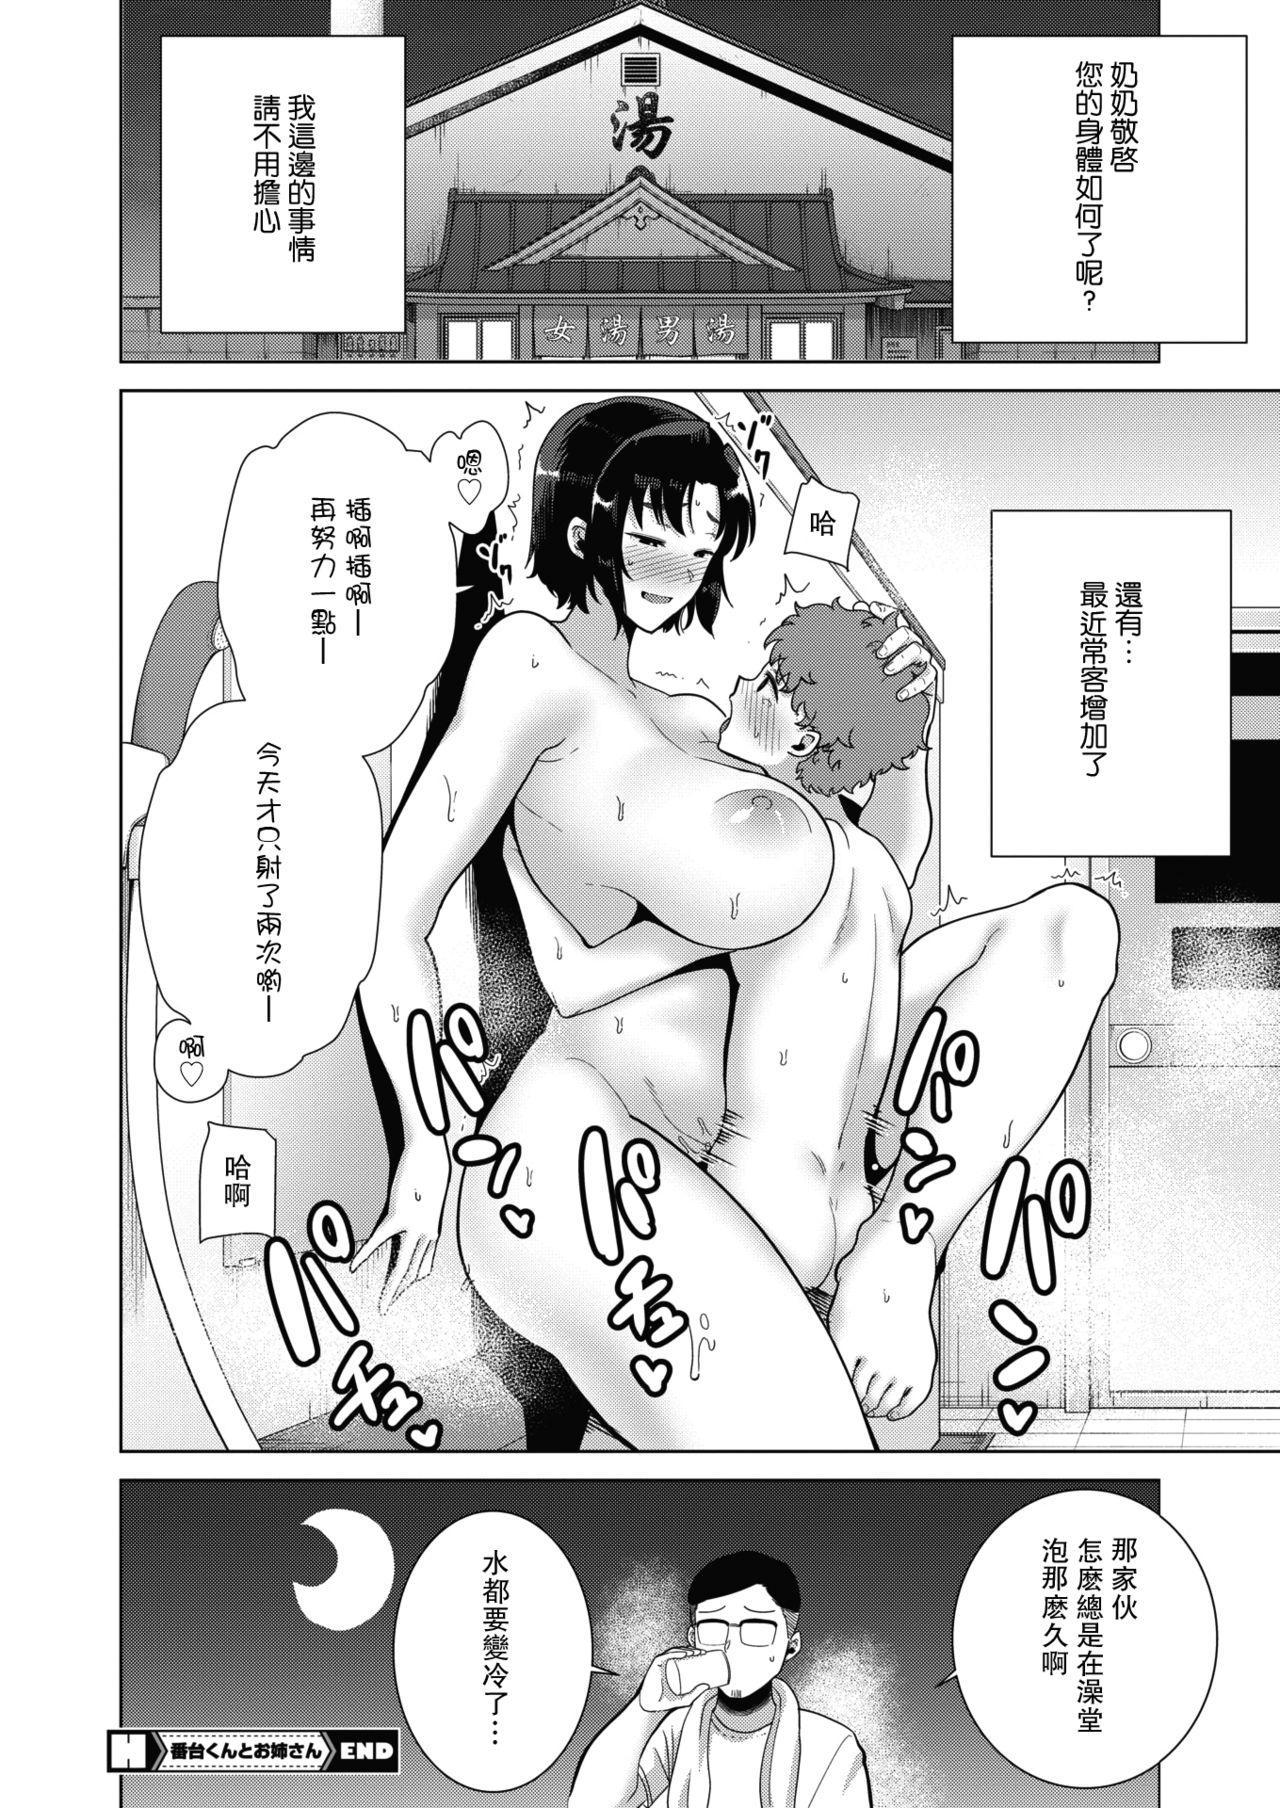 [Kurosu Gatari] Bandai-kun to Onee-san (COMIC HOTMILK 2020-08) [Chinese] [瓜皮汉化] [Digital] 23